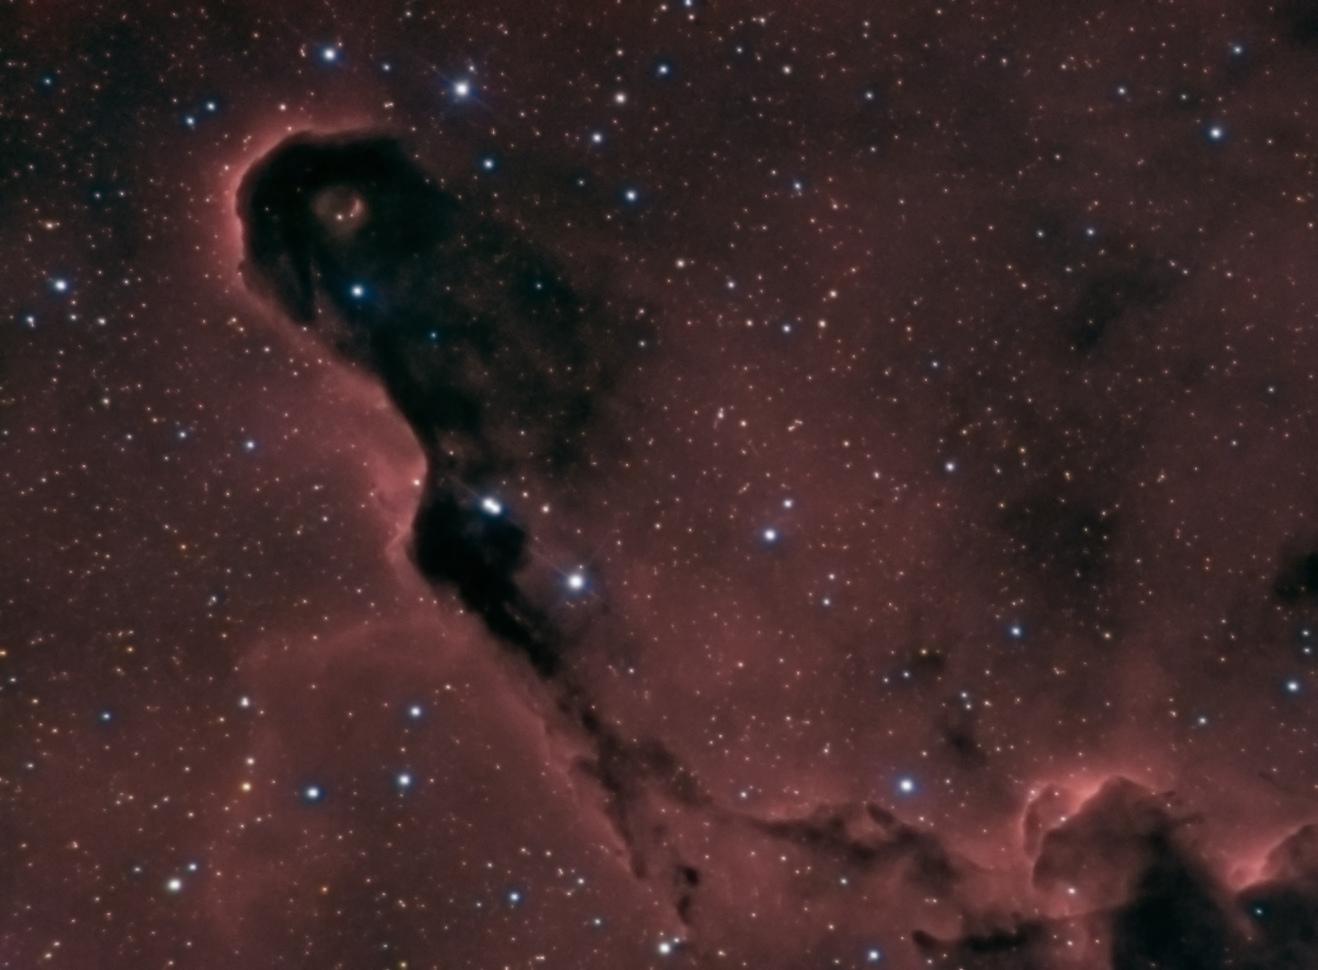 IC1396_v2_j.jpg.c716f59ebaa76f9ee93e25c9bec4abc0.jpg